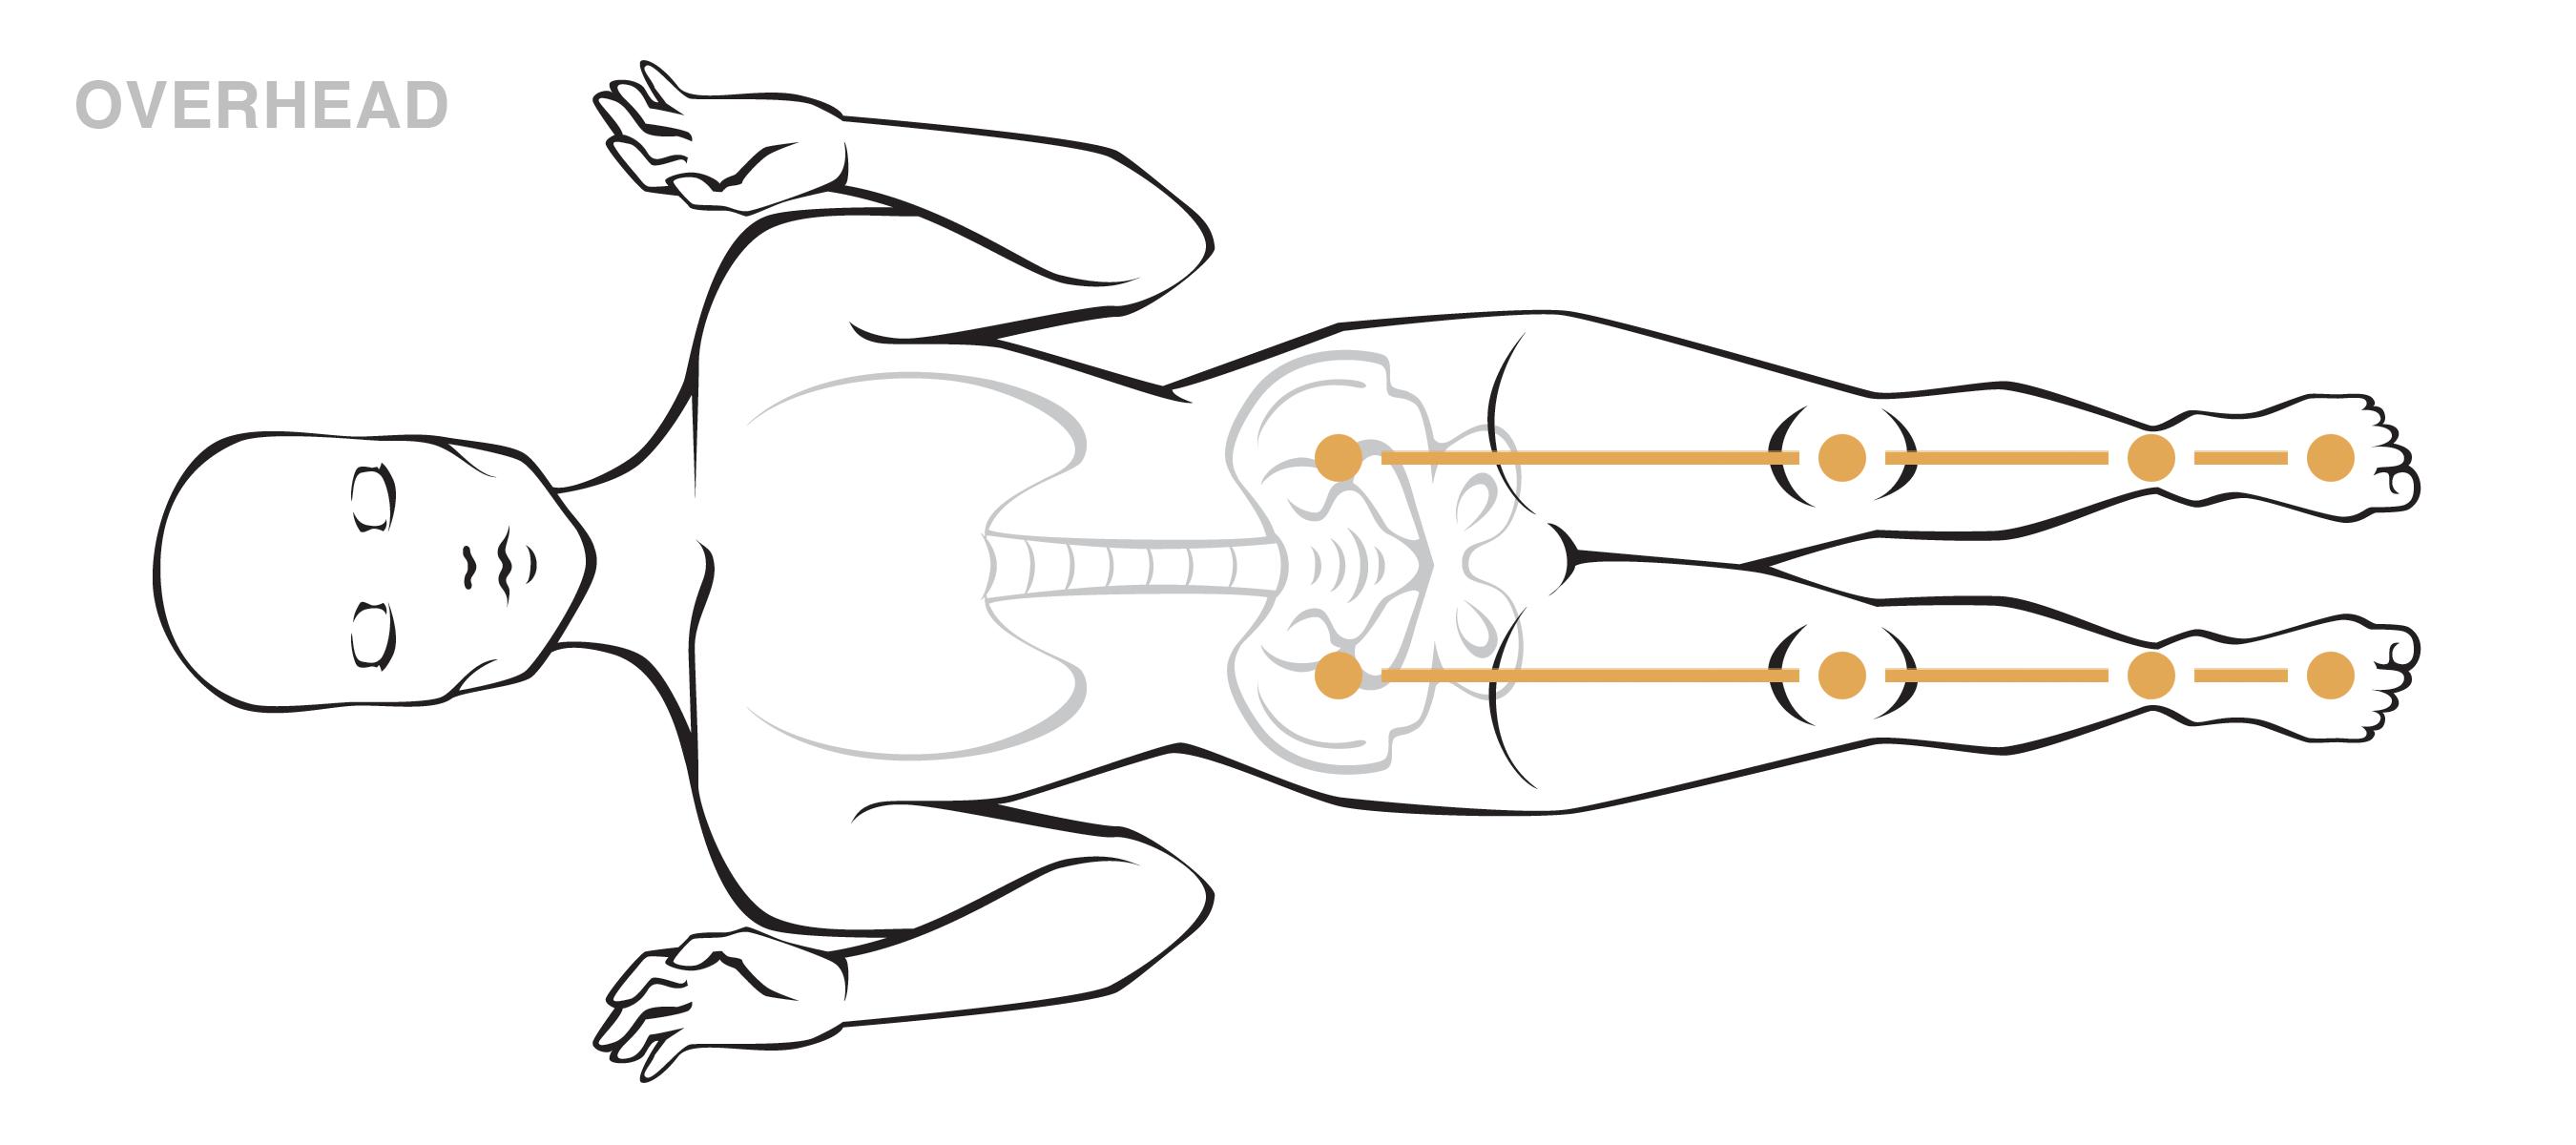 F5-PelvicTilt-0